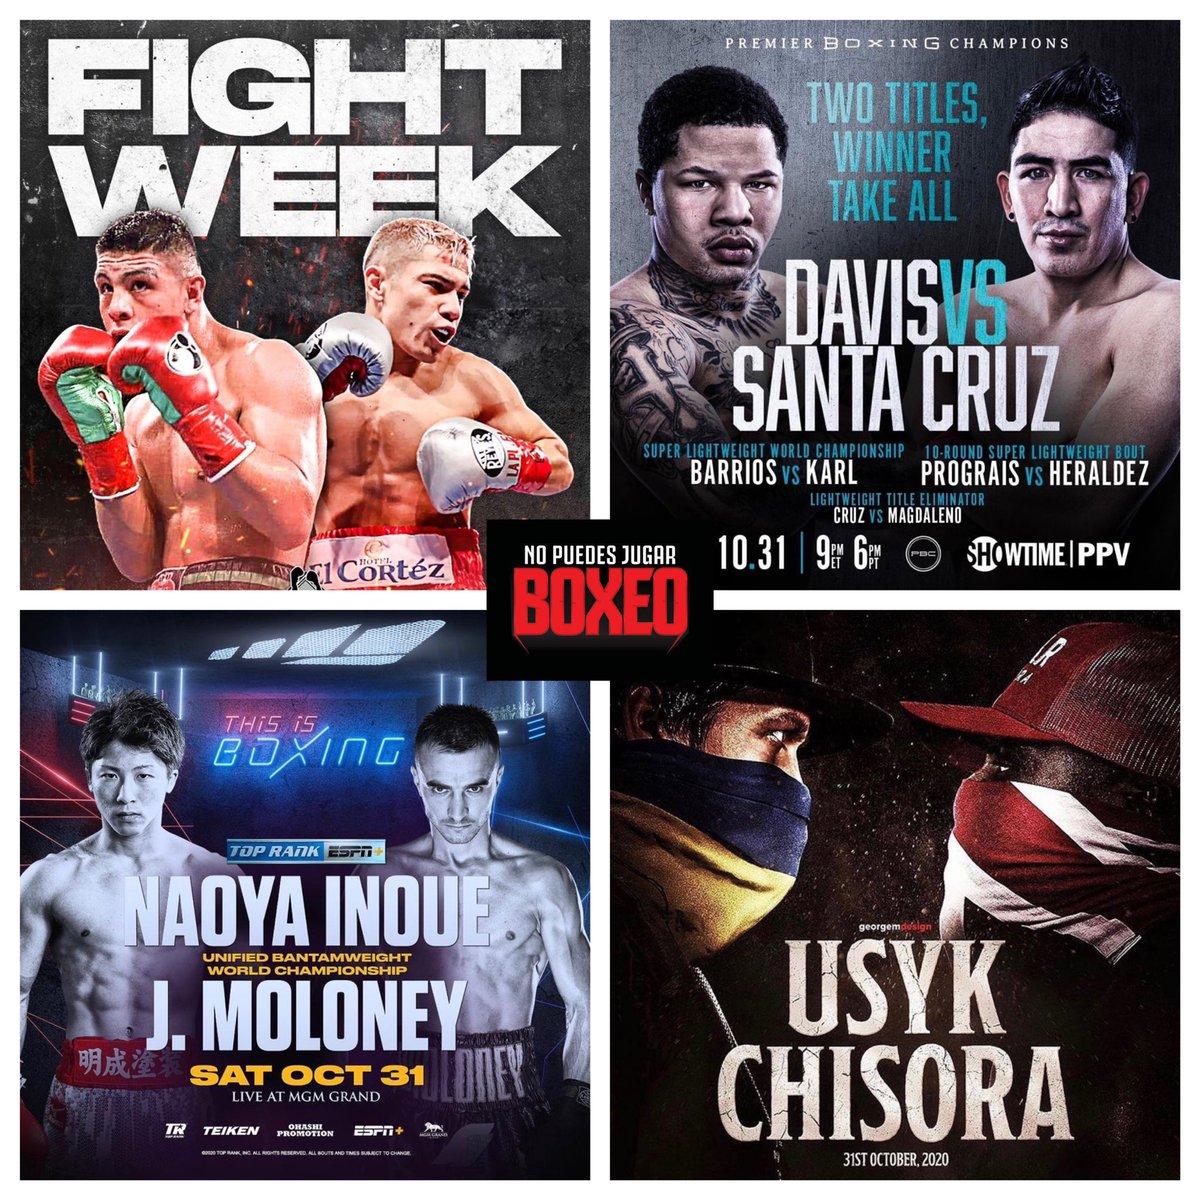 ‼️Enumera del 1 al 4 ¿Cuál crees que será la mejor pelea del fin de semana? ‼️🔥🥊 #nopuedesjugarboxeo #npjb #box #boxeo #boxing #boxeoprofesional #losangeles #california #dazn #toprank  #toprankboxing #pbcboxing #goldenboypromotions #munguiajohnson #davissantacruz #inouemoloney https://t.co/EJtPfG1Gxy